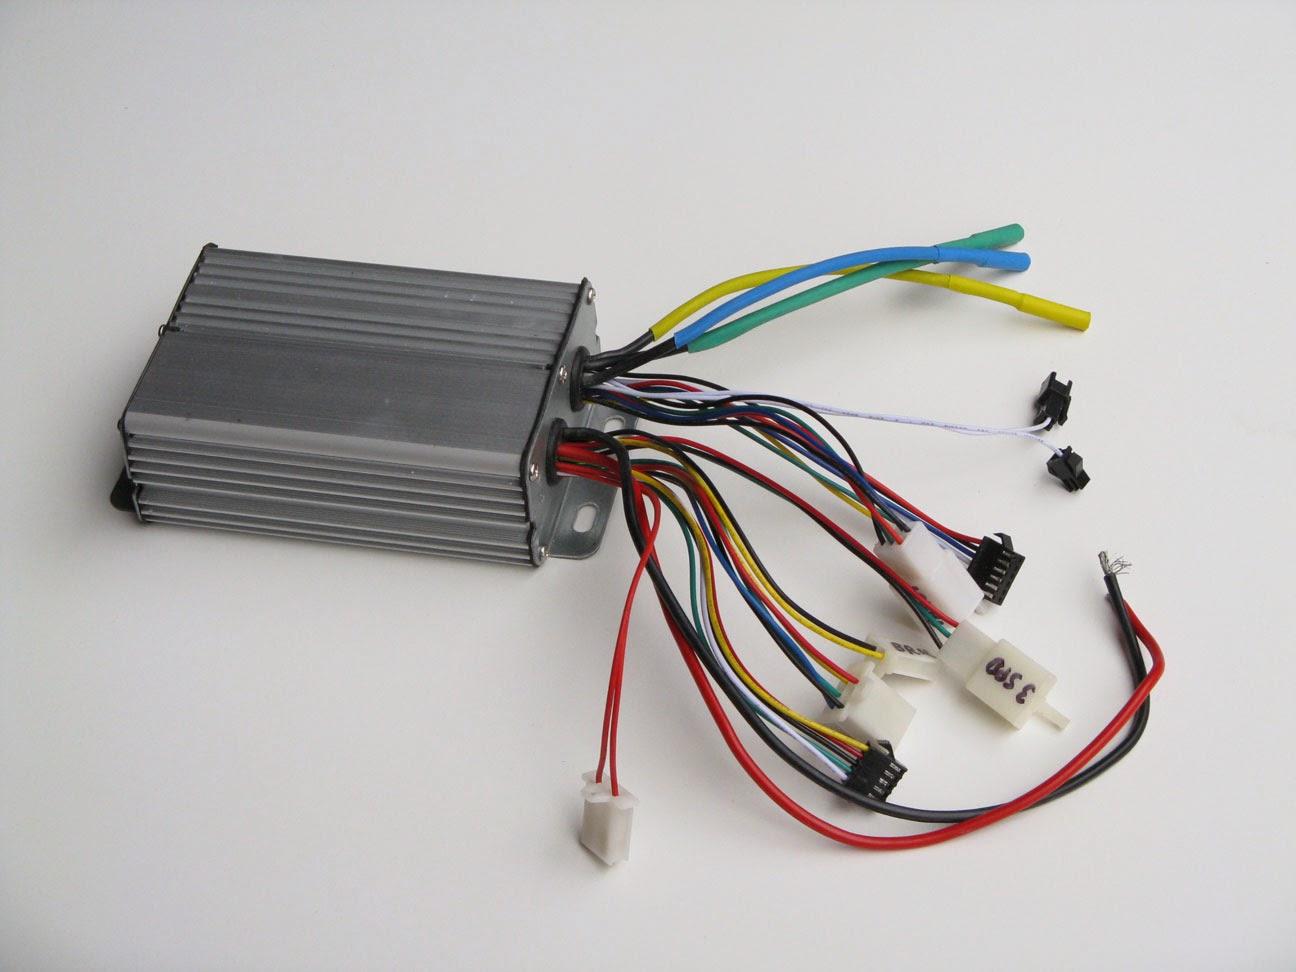 My Solar Electric Cargo Bike: The motor